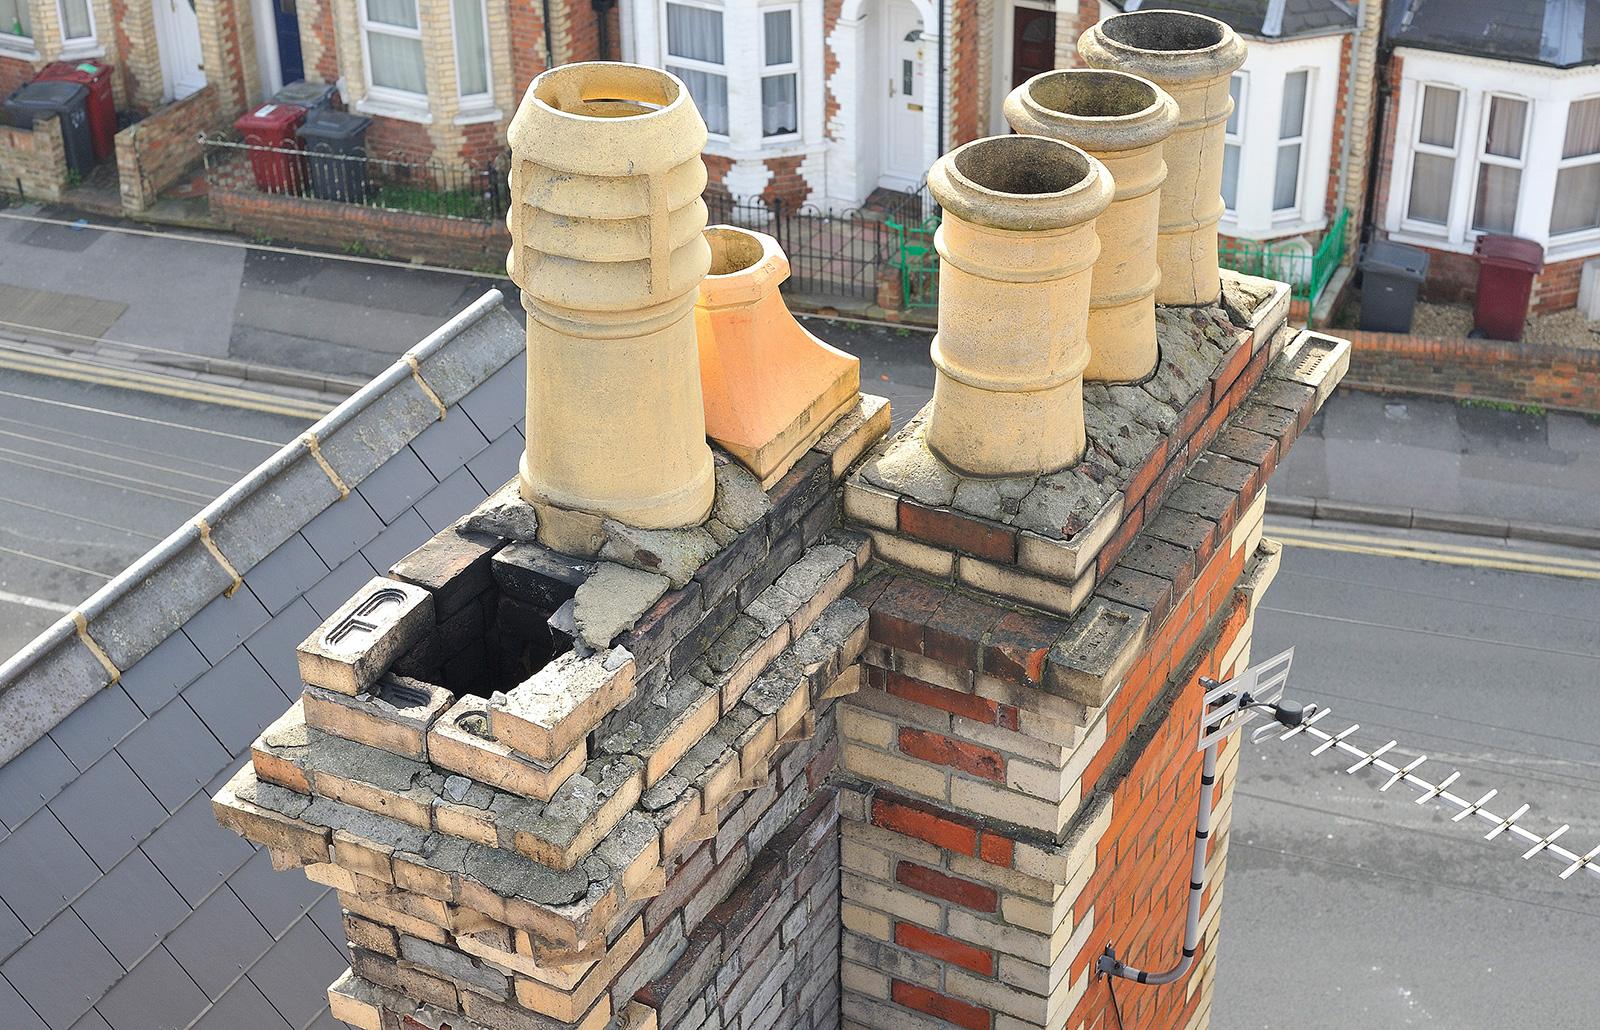 Missing chimney pot